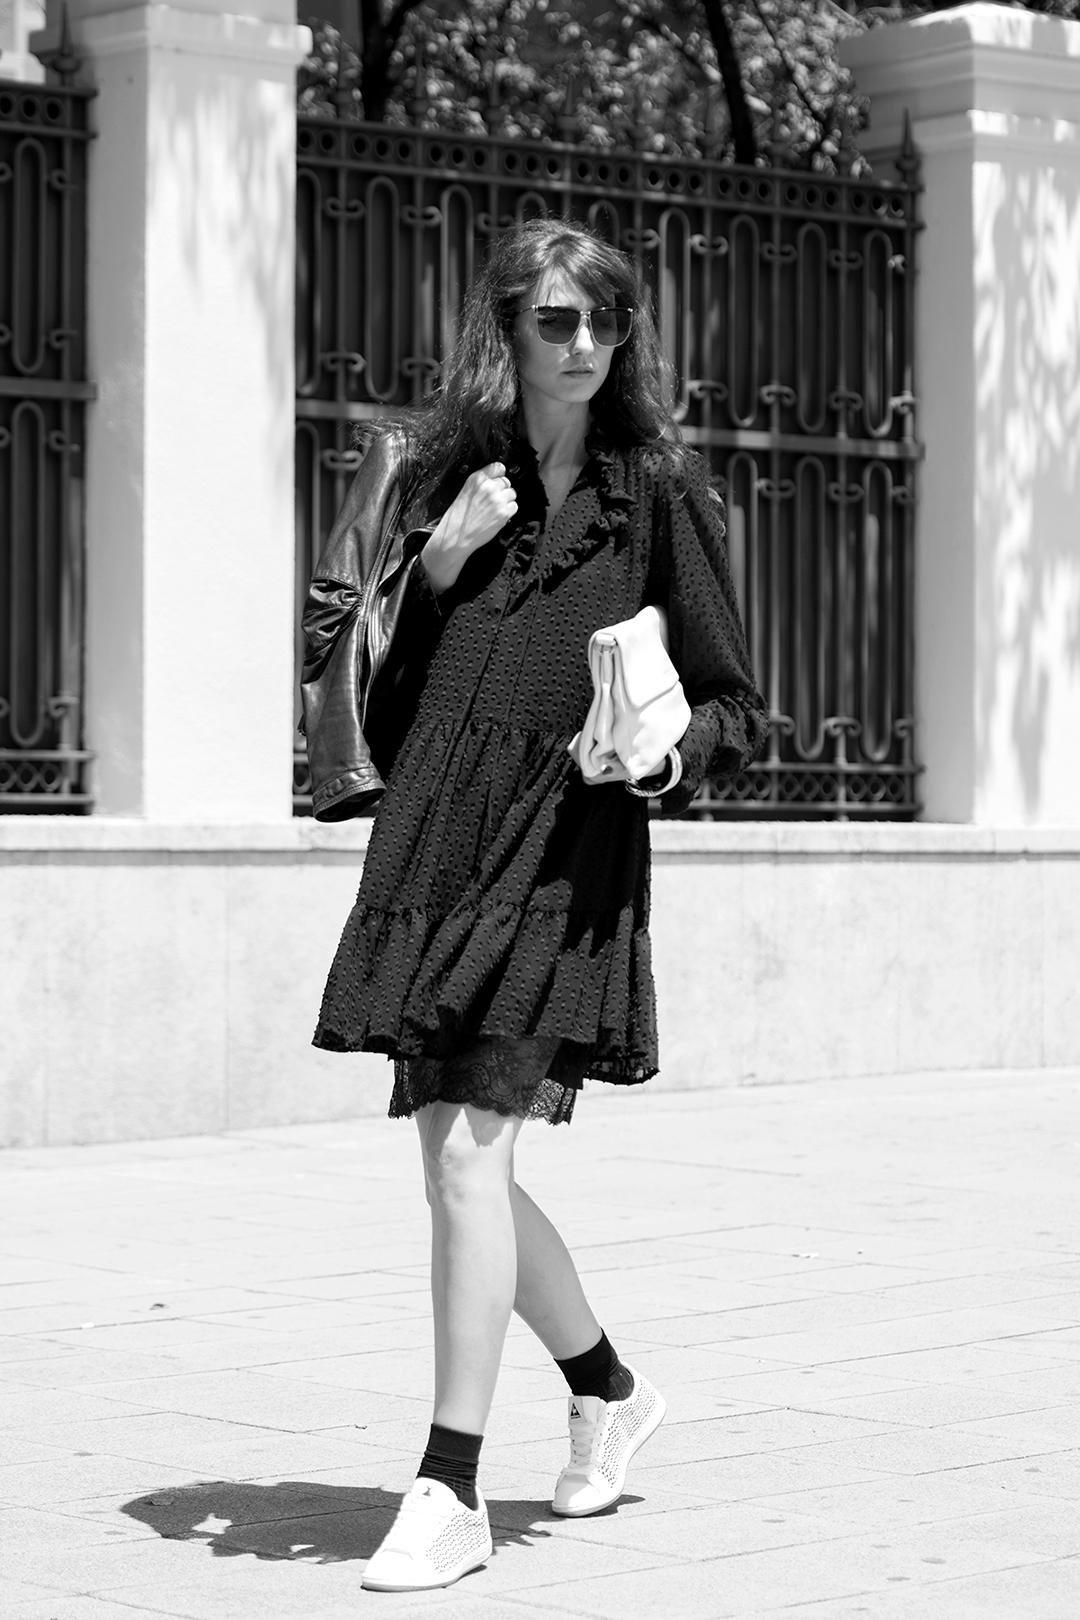 le-petite-robe-noir-mitmeblog-streetstyle-guerlain-bn-web-07